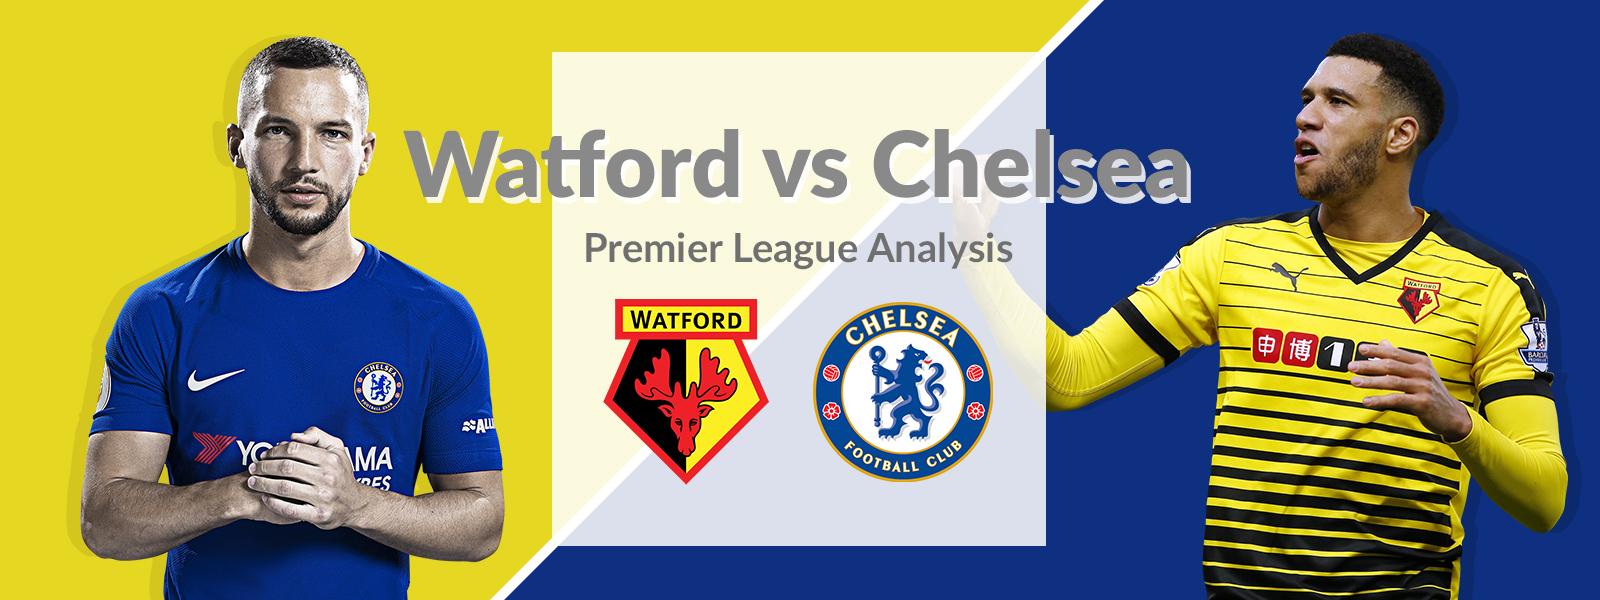 Watford vs Chelsea: Premier League Analysis